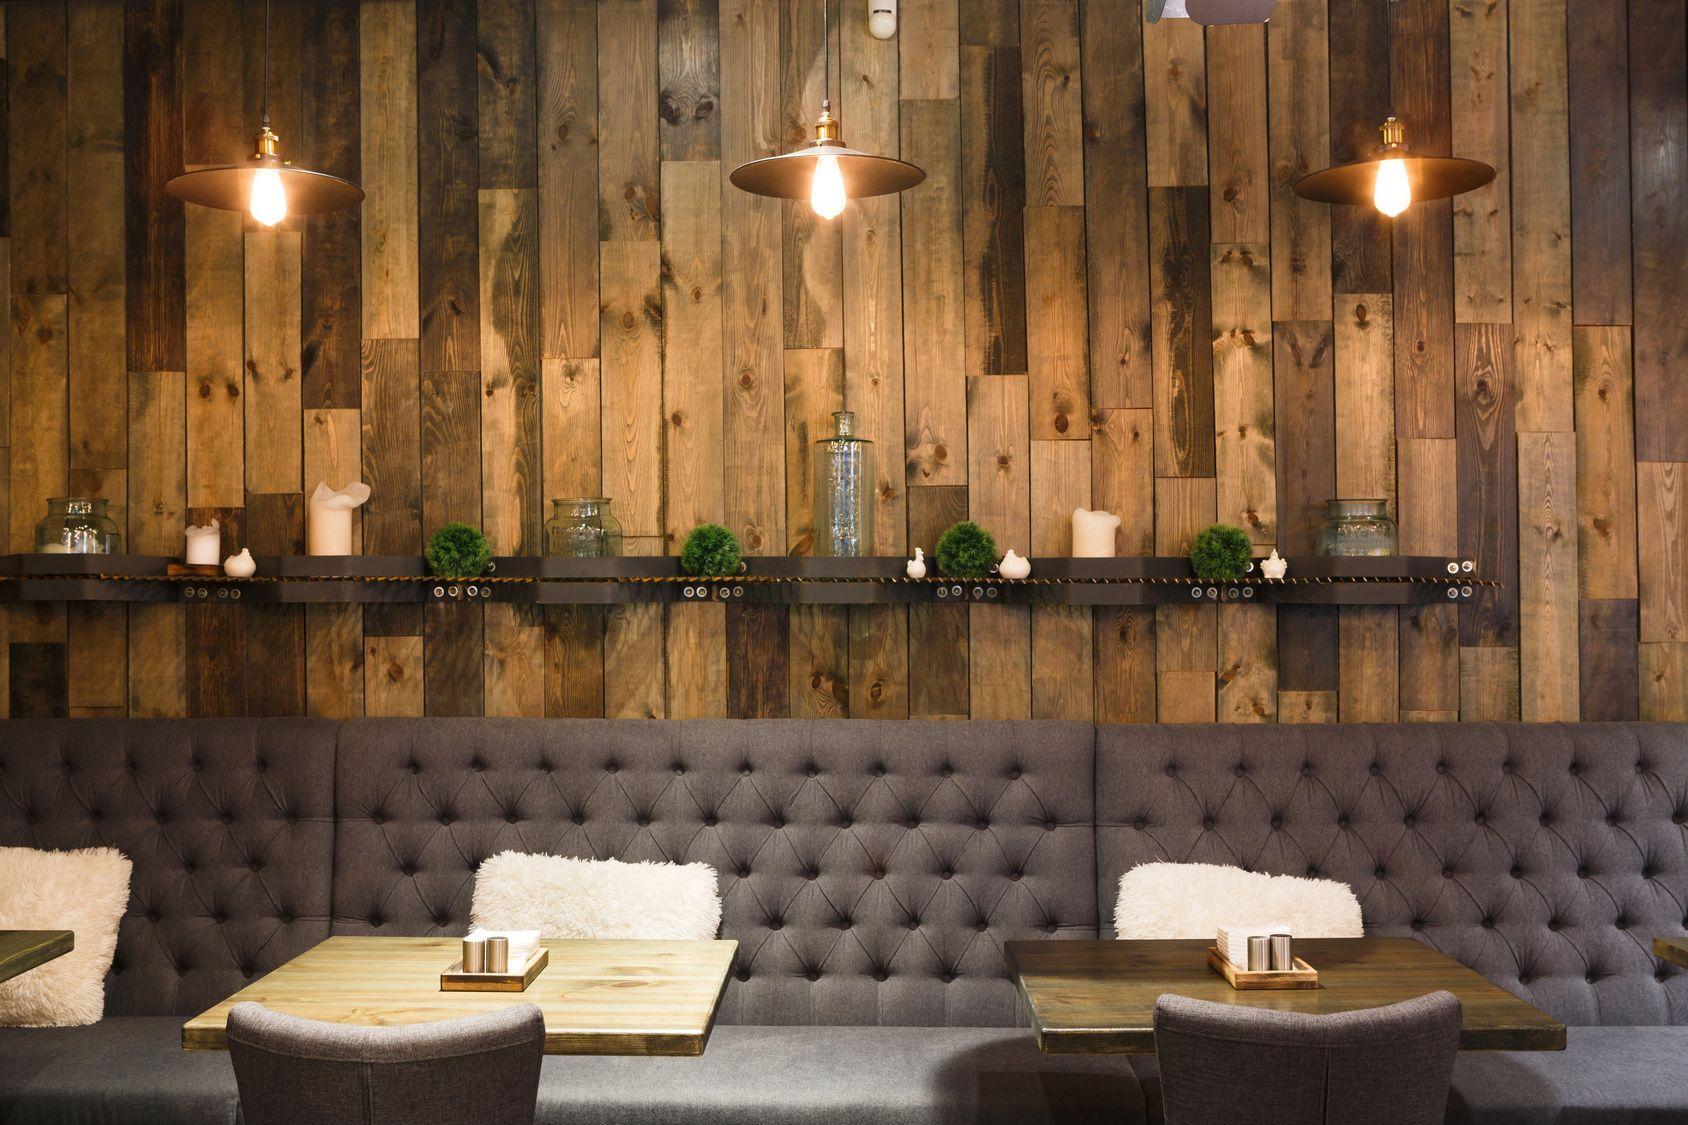 Restaurant Gestaltung Ladenbau Design